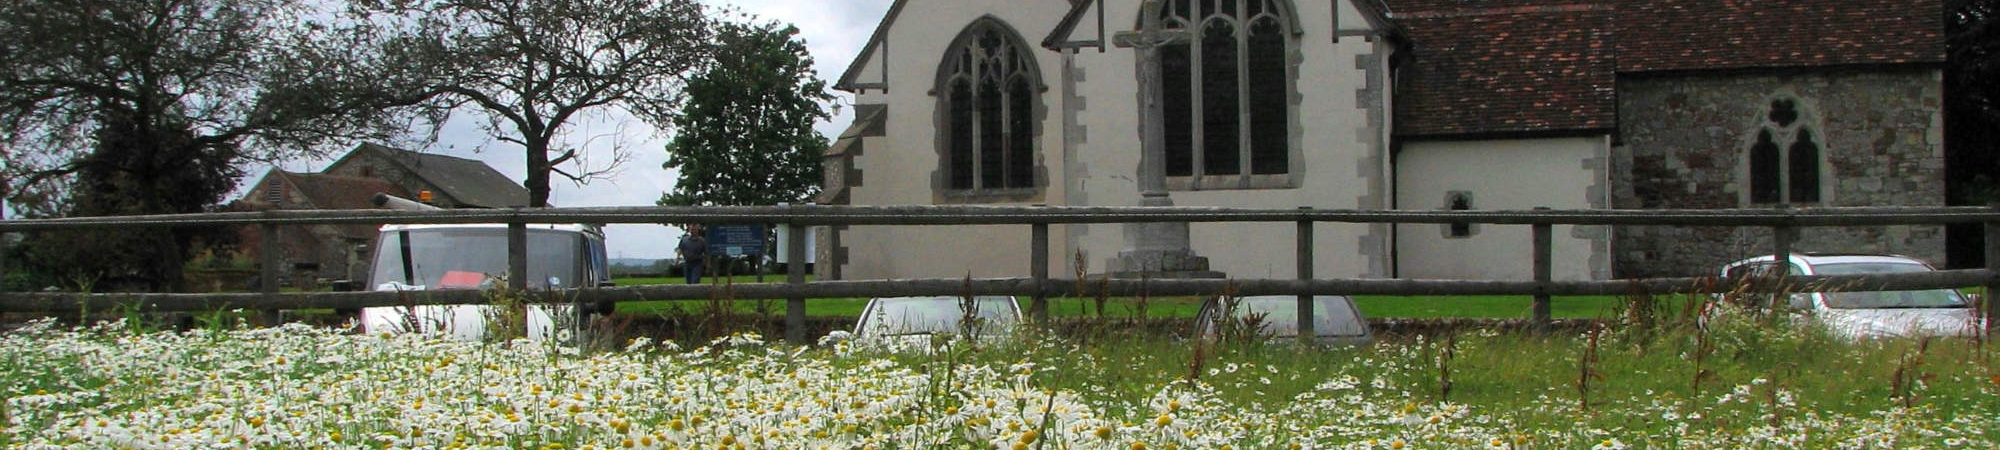 Binsted Church Ox Eye Daisies